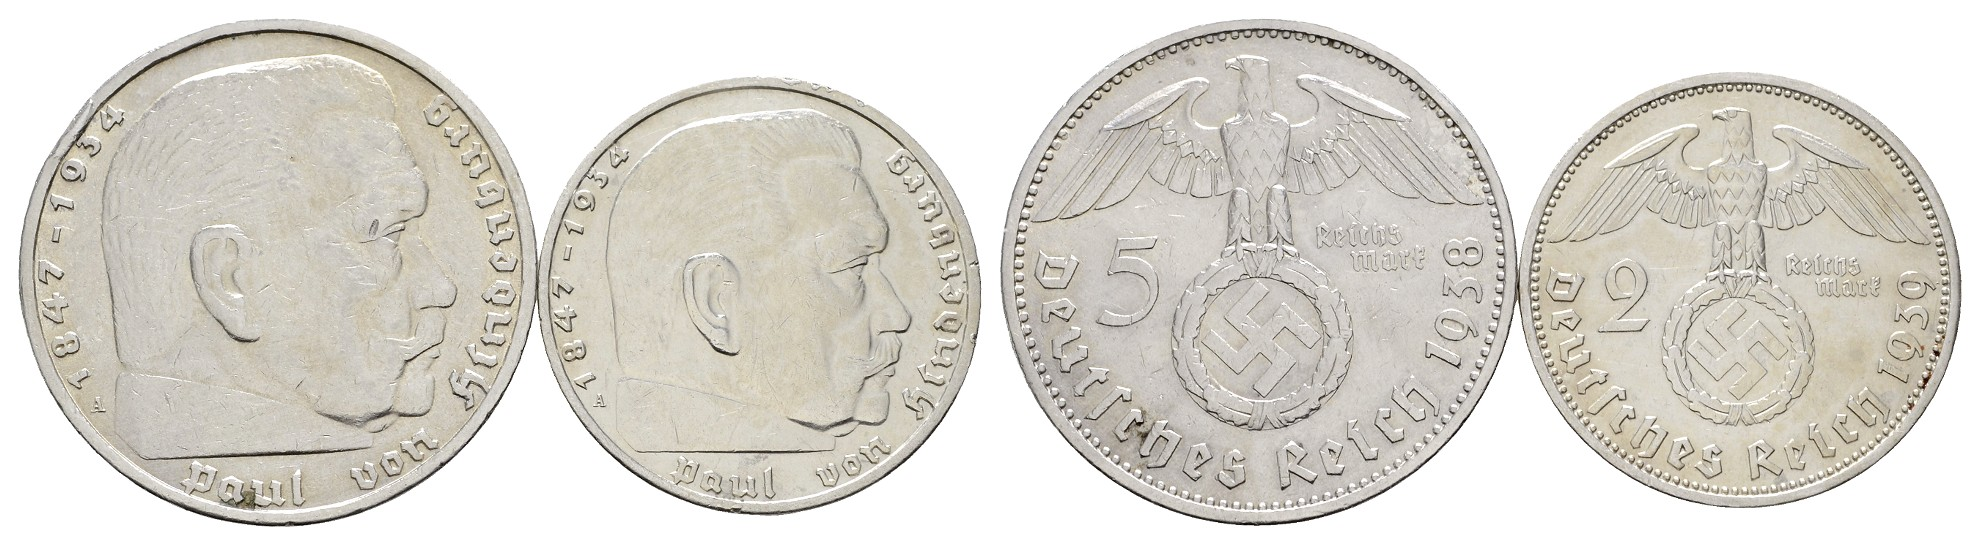 MGS III. Reich 5 Reichsmark 1938 A kl.Rdf. + 2 Reichsmark 1939 A Hindenburg